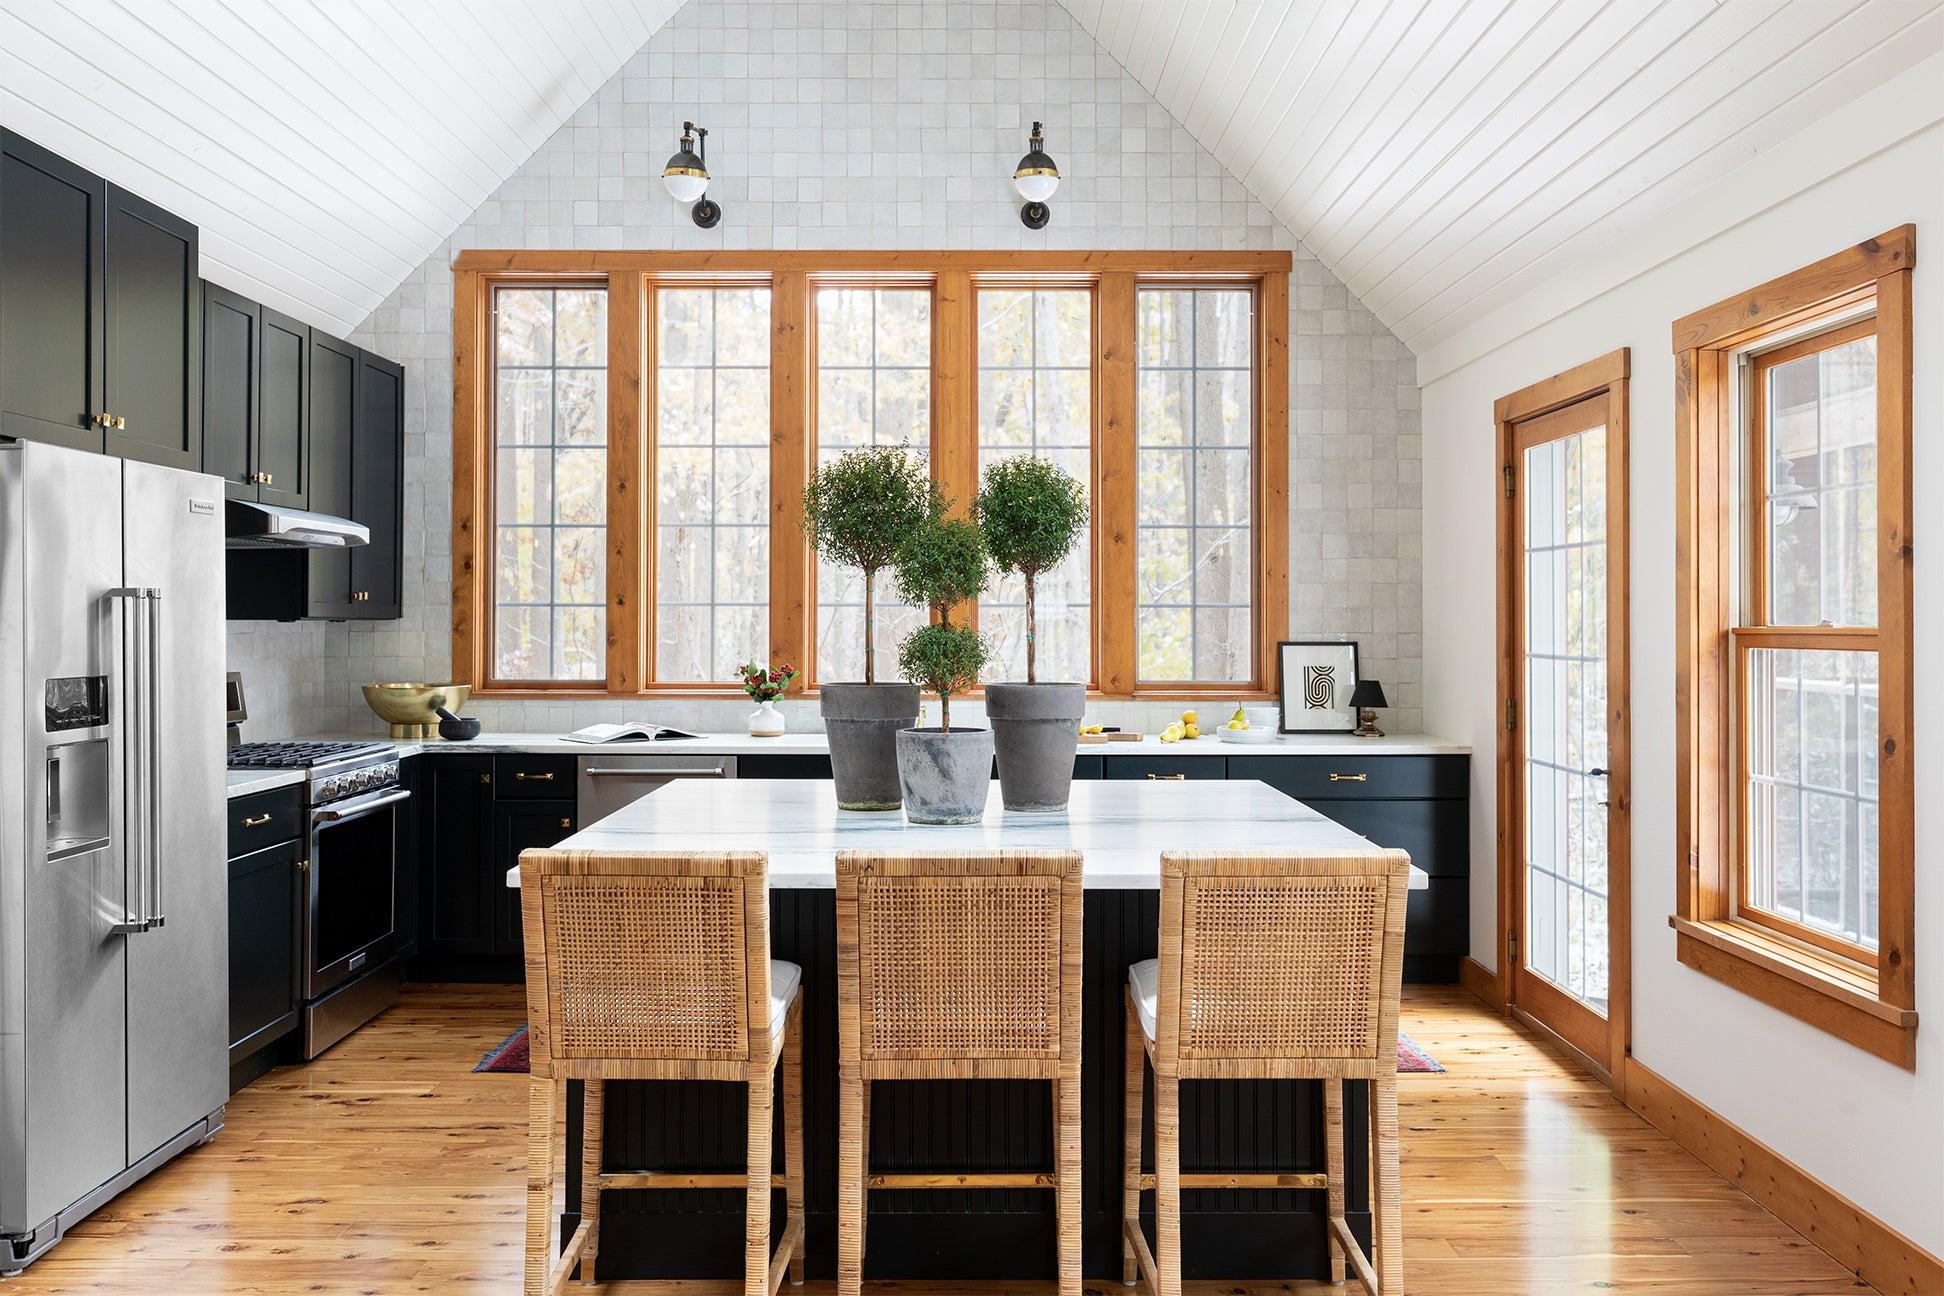 kitchen with island barstools